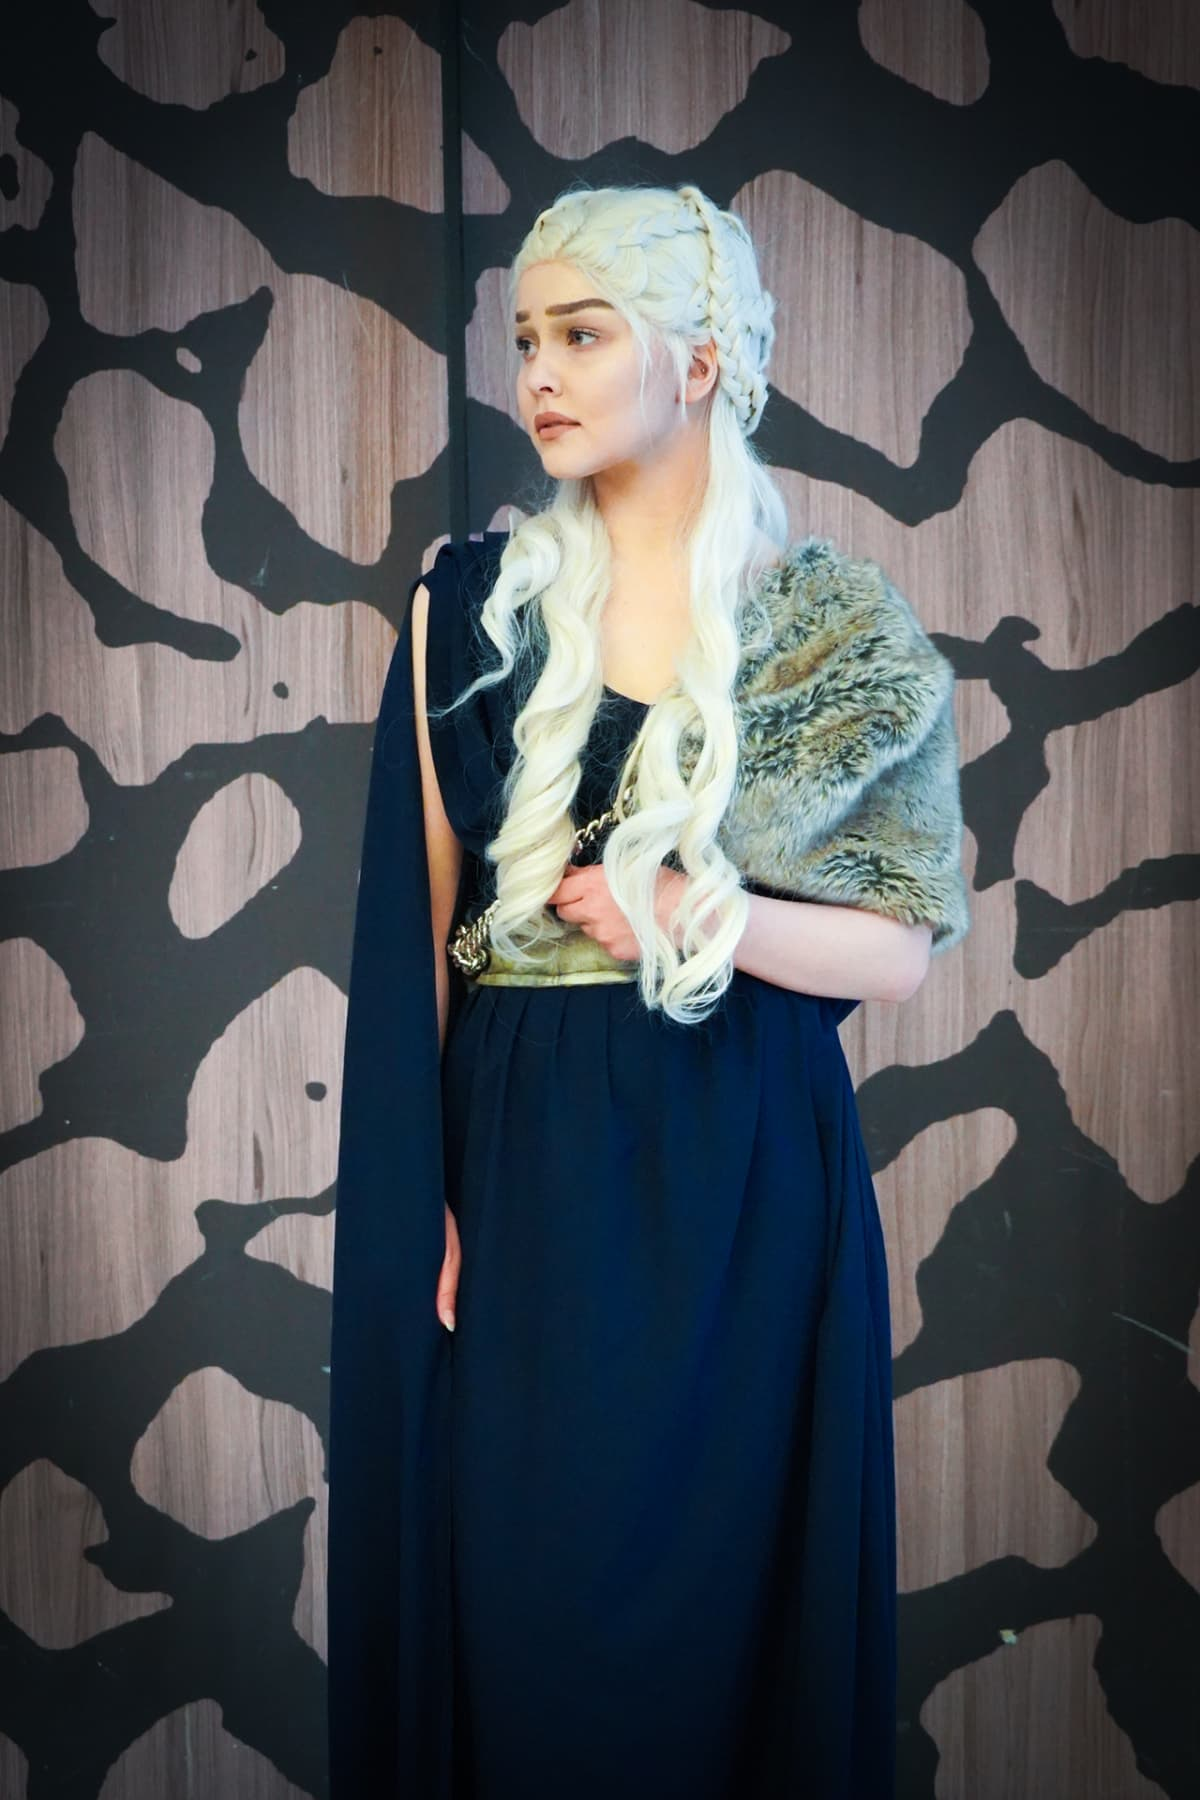 Game of Thrones, cosplay, Daenerys Targaryen, Popcult